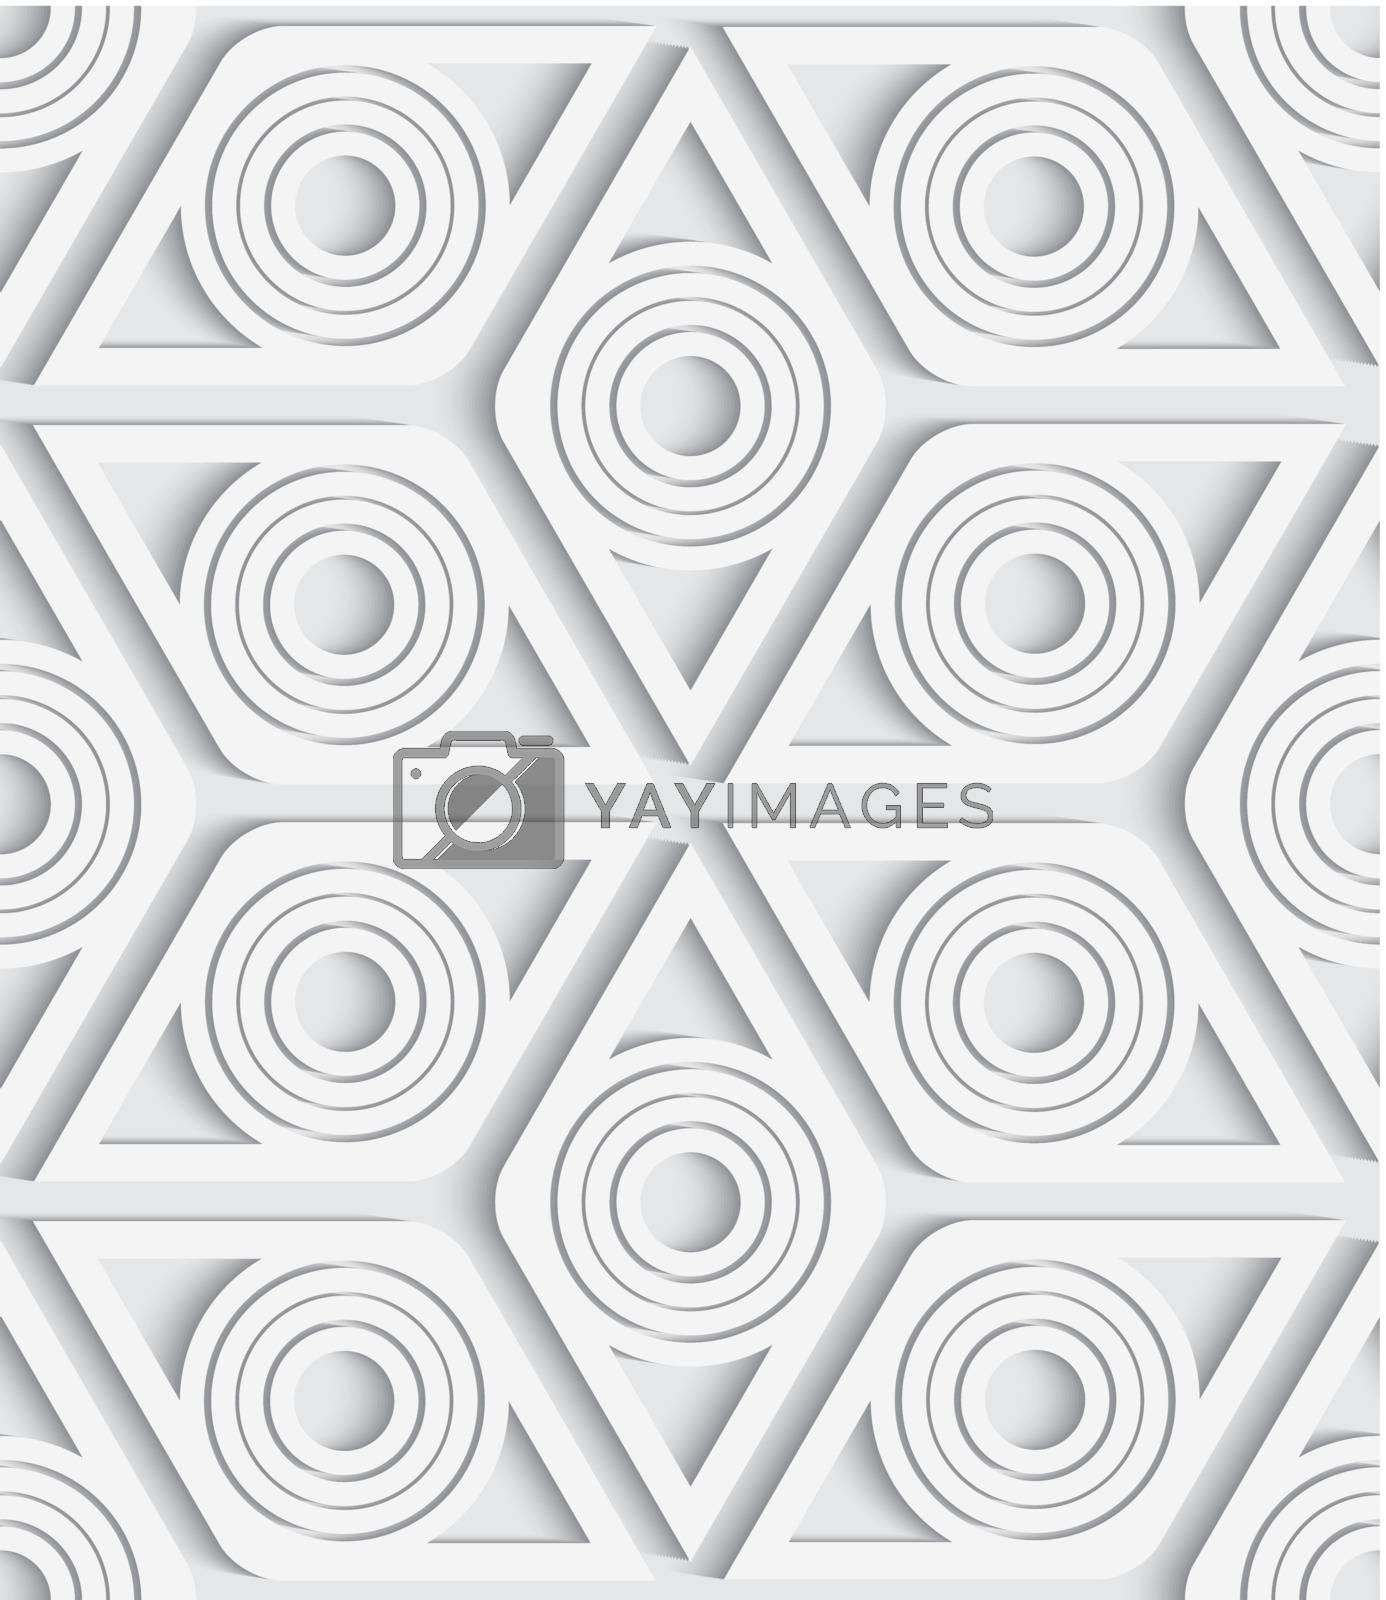 Geometrical rhombus seamless pattern cut out by Zebra-Finch